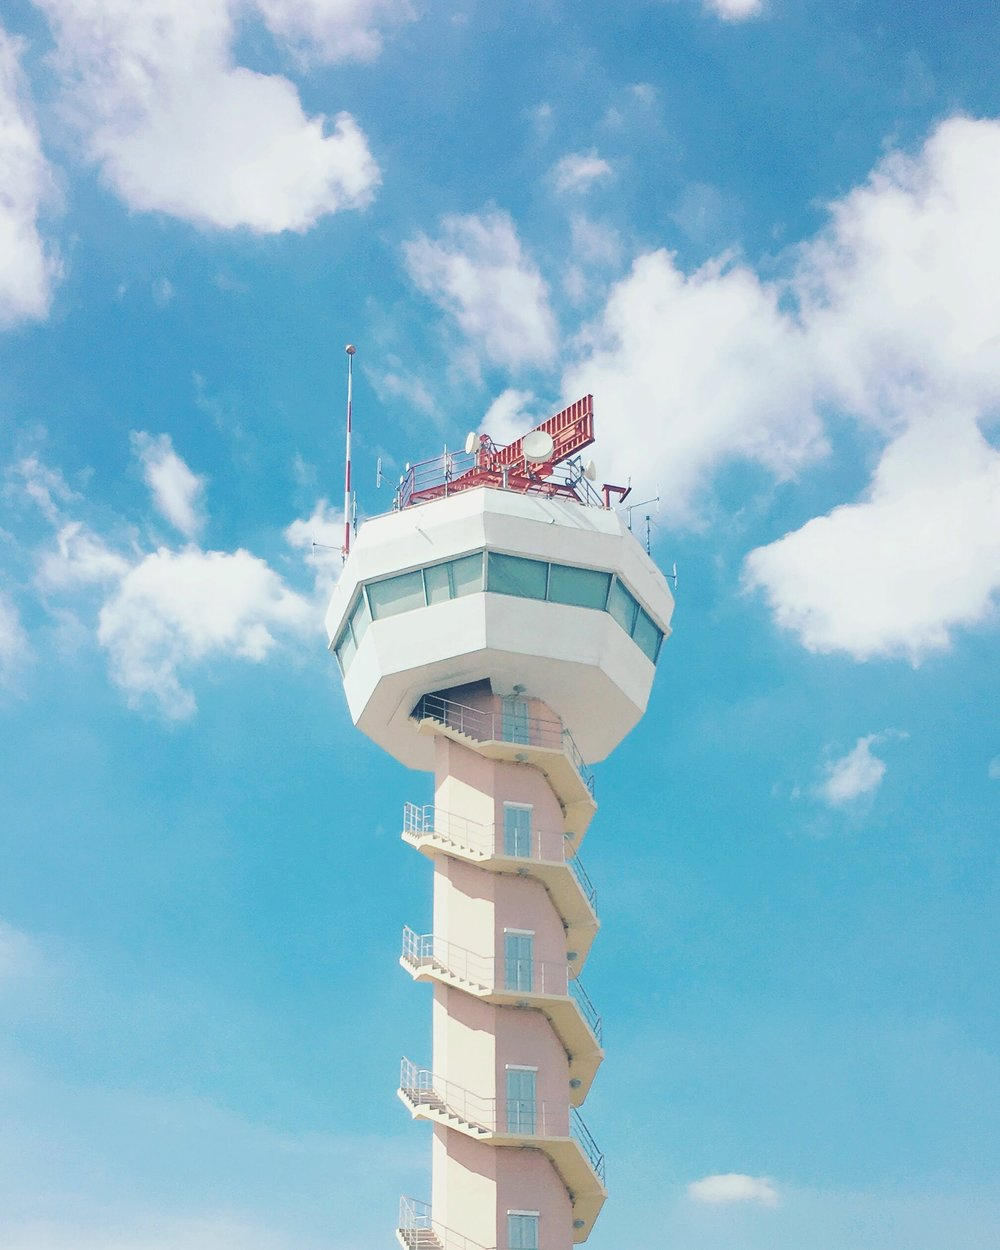 ¿Que hace un controlador aéreo?